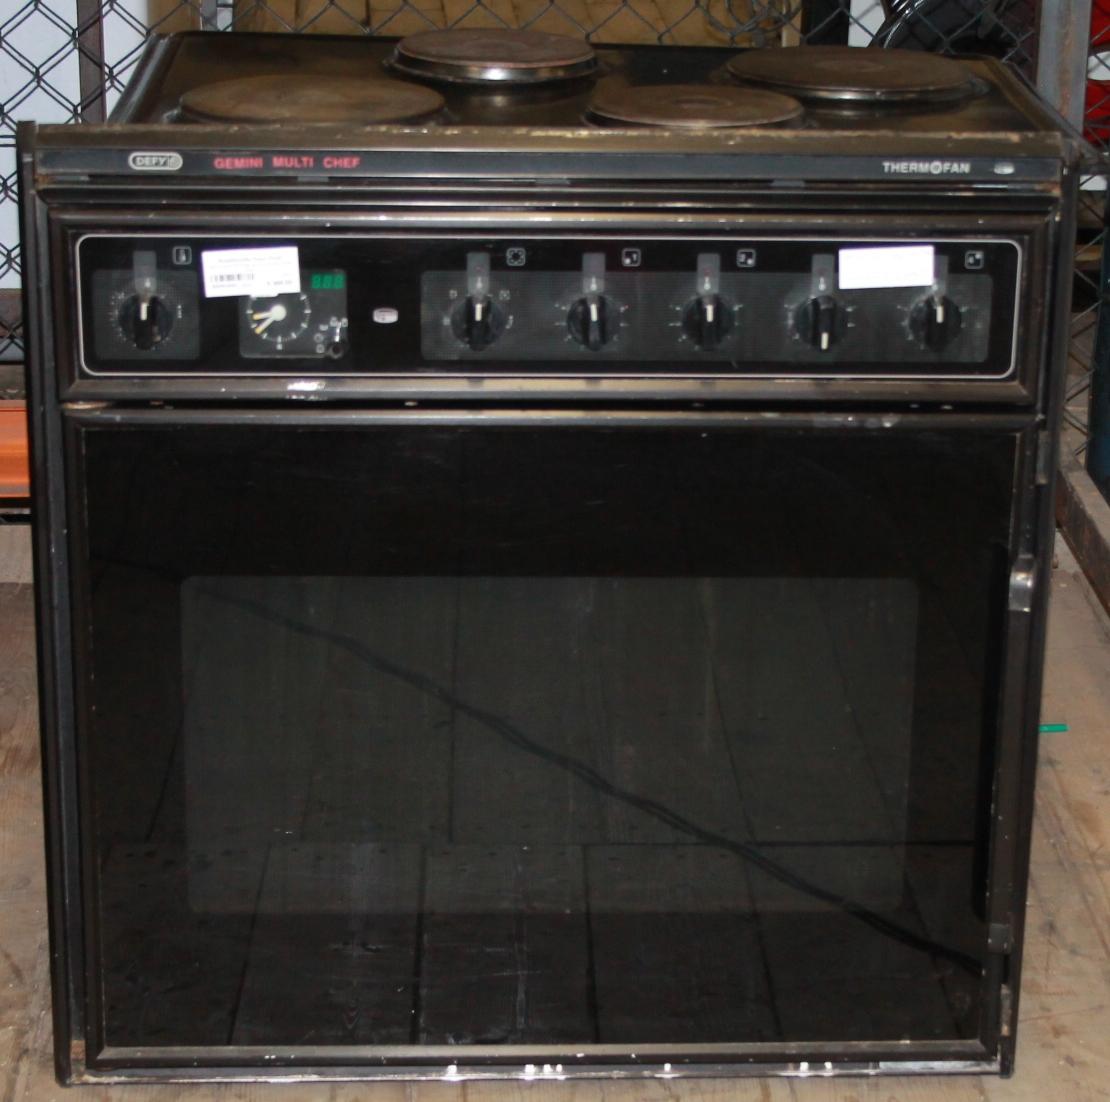 Defy stove S029154a #Rosettenvillepawnshop